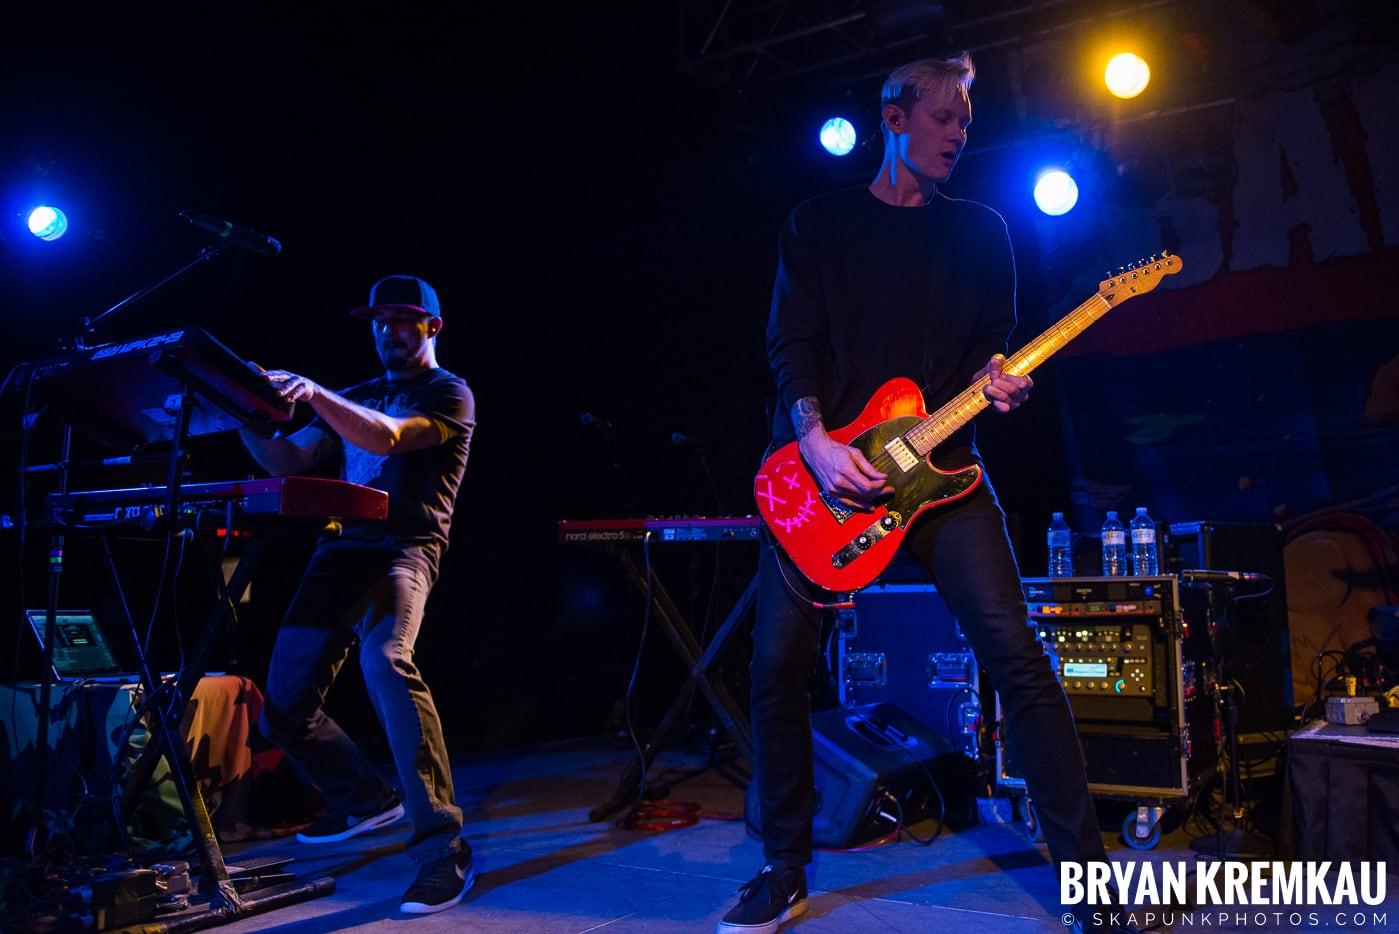 Ballyhoo! @ Starland Ballroom, Sayreville, NJ - 11.23.18 (8)